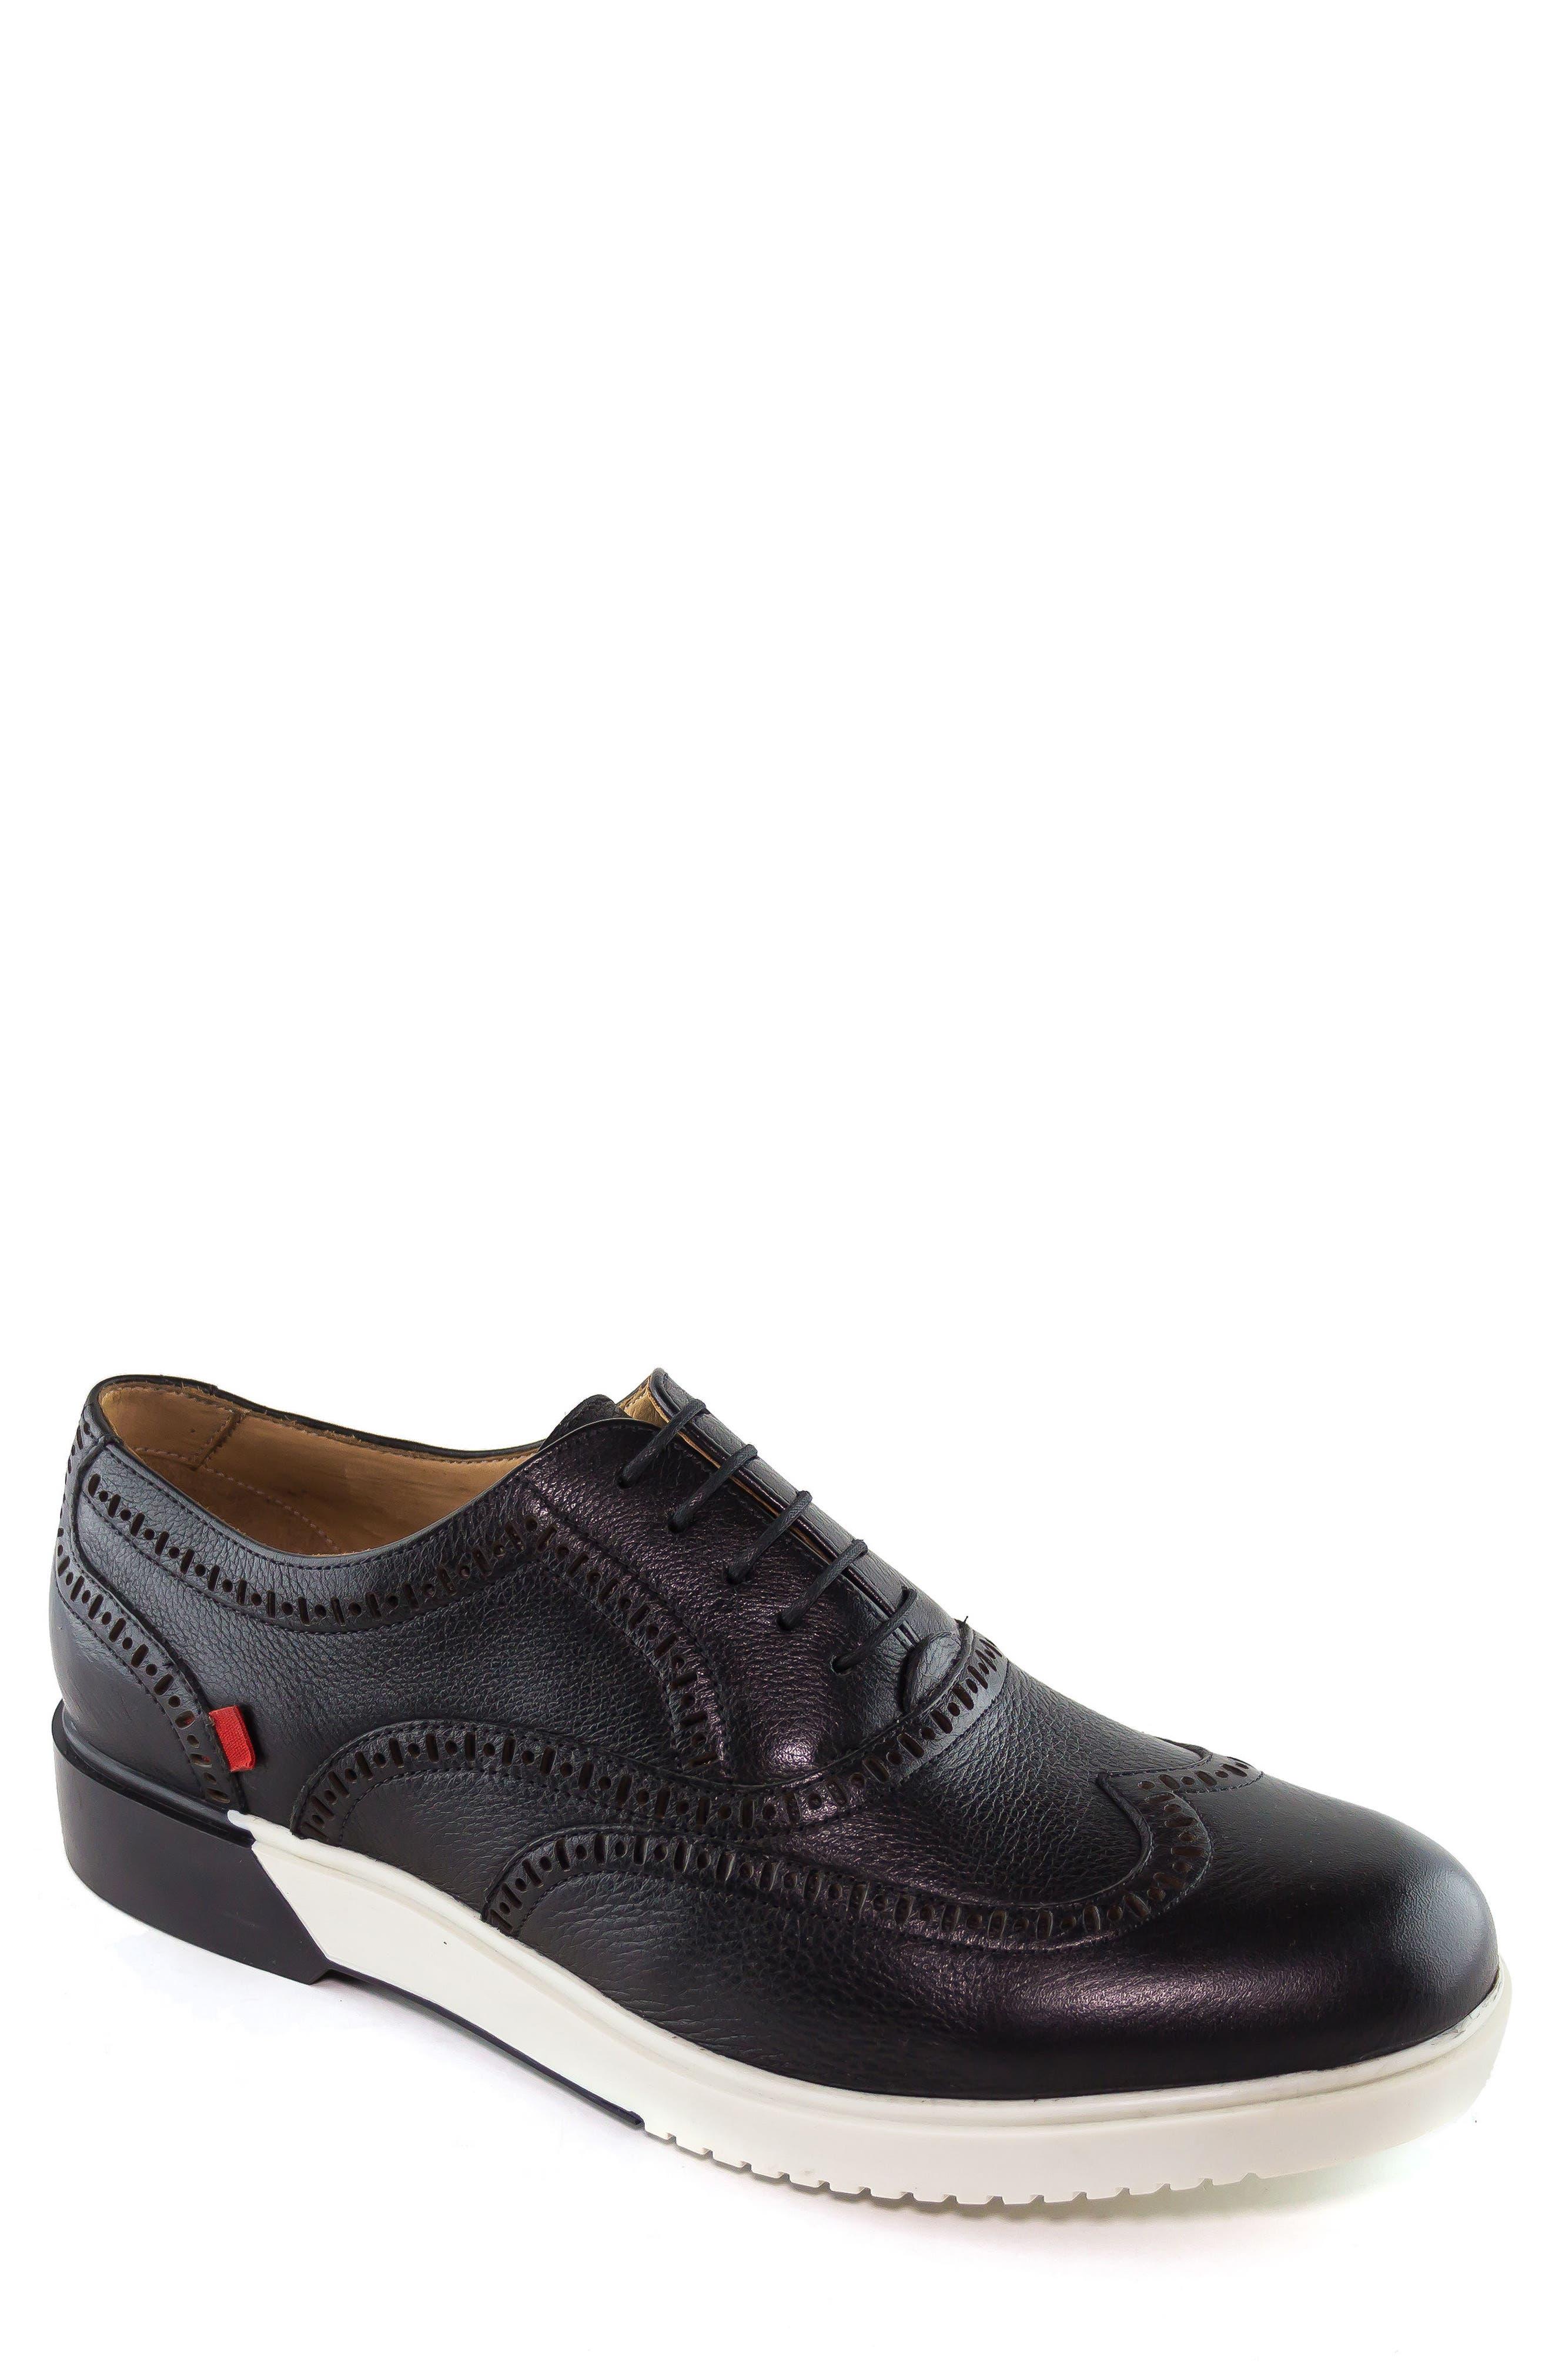 MARC JOSEPH NEW YORK 5th Ave Wingtip Sneaker, Main, color, 001